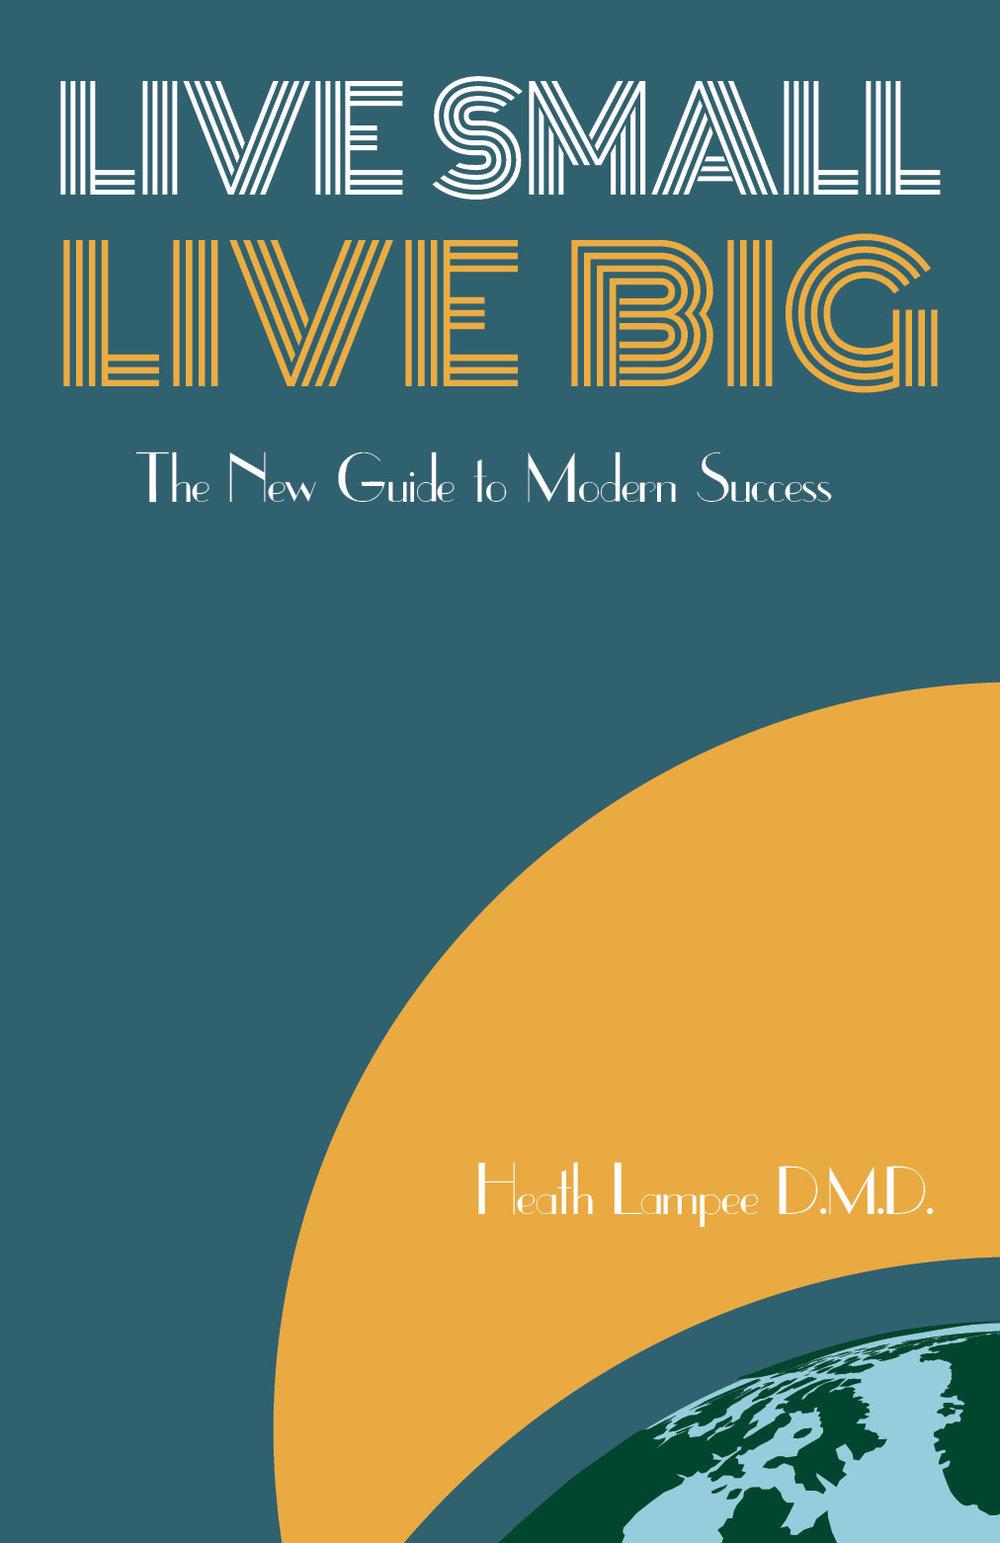 Live Small, Live Big